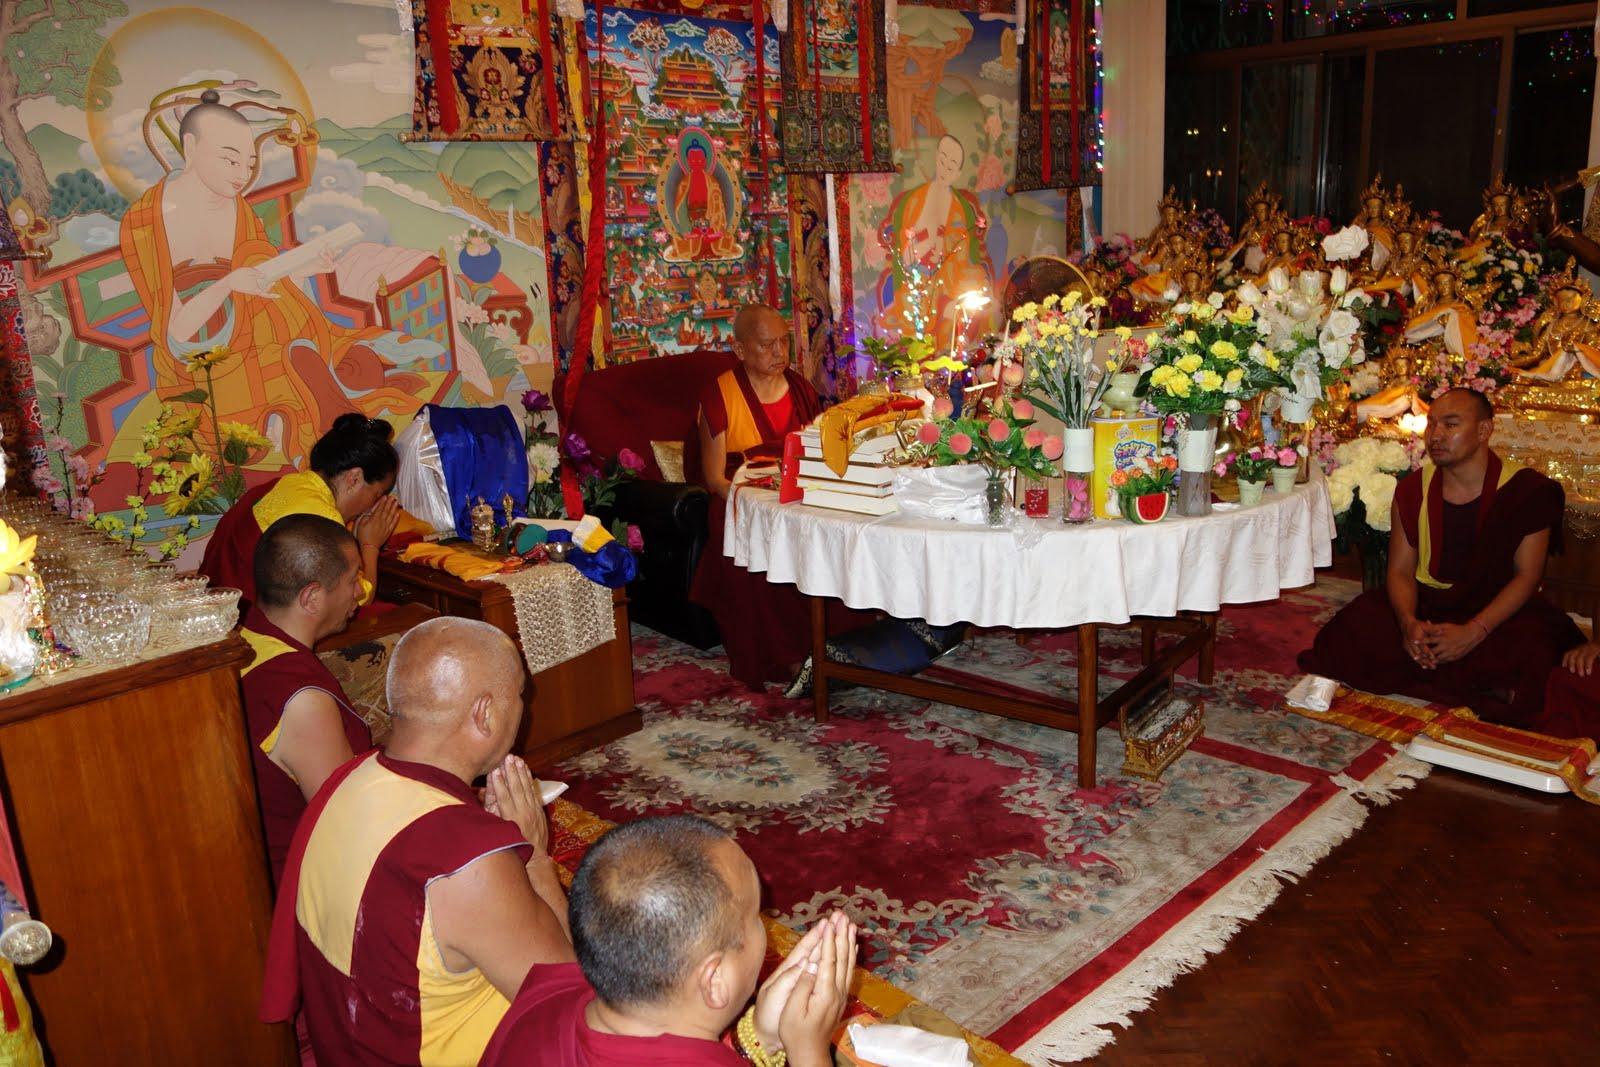 Rinpoche and Khadro-la with Lama Gyupa monks doing Yamantaka self initiniation. Kopan Monastery. May 11, 2013, Photo by Ven.  Roger Kunsang.